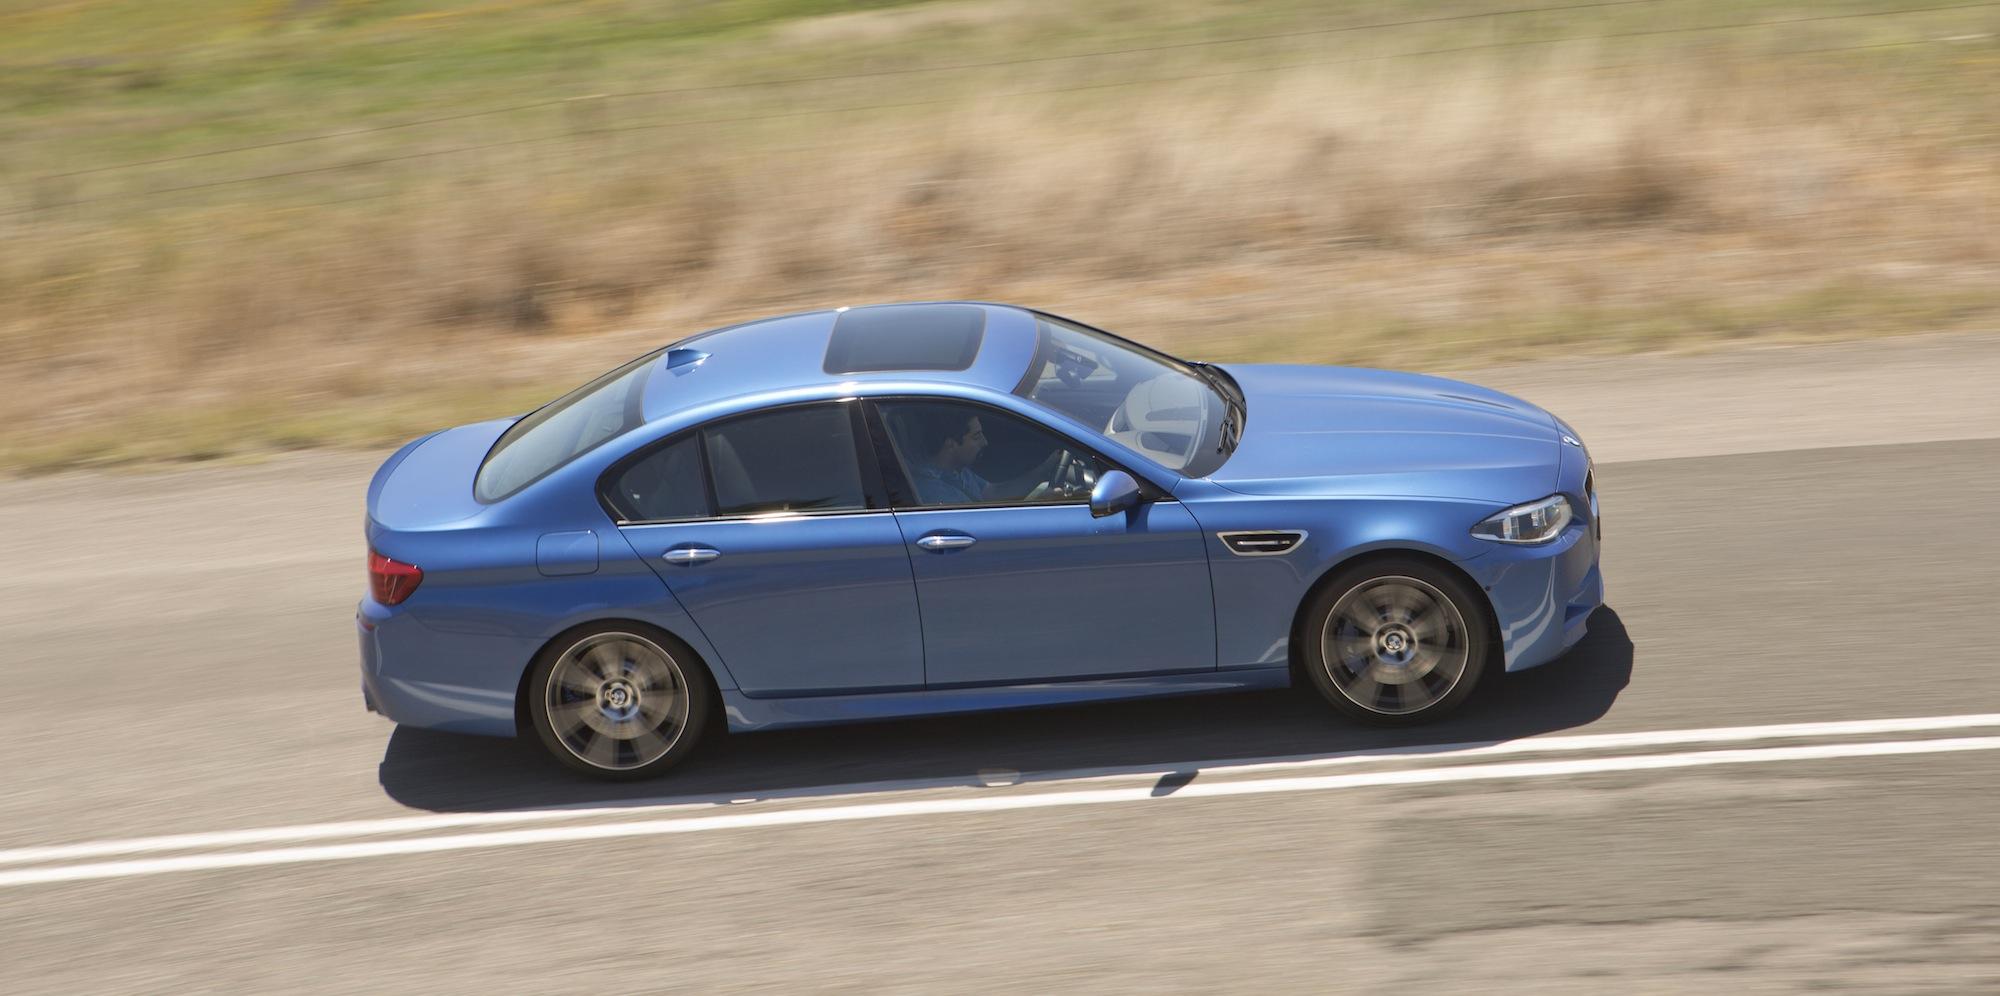 Bmw f20 m135i review by car advice